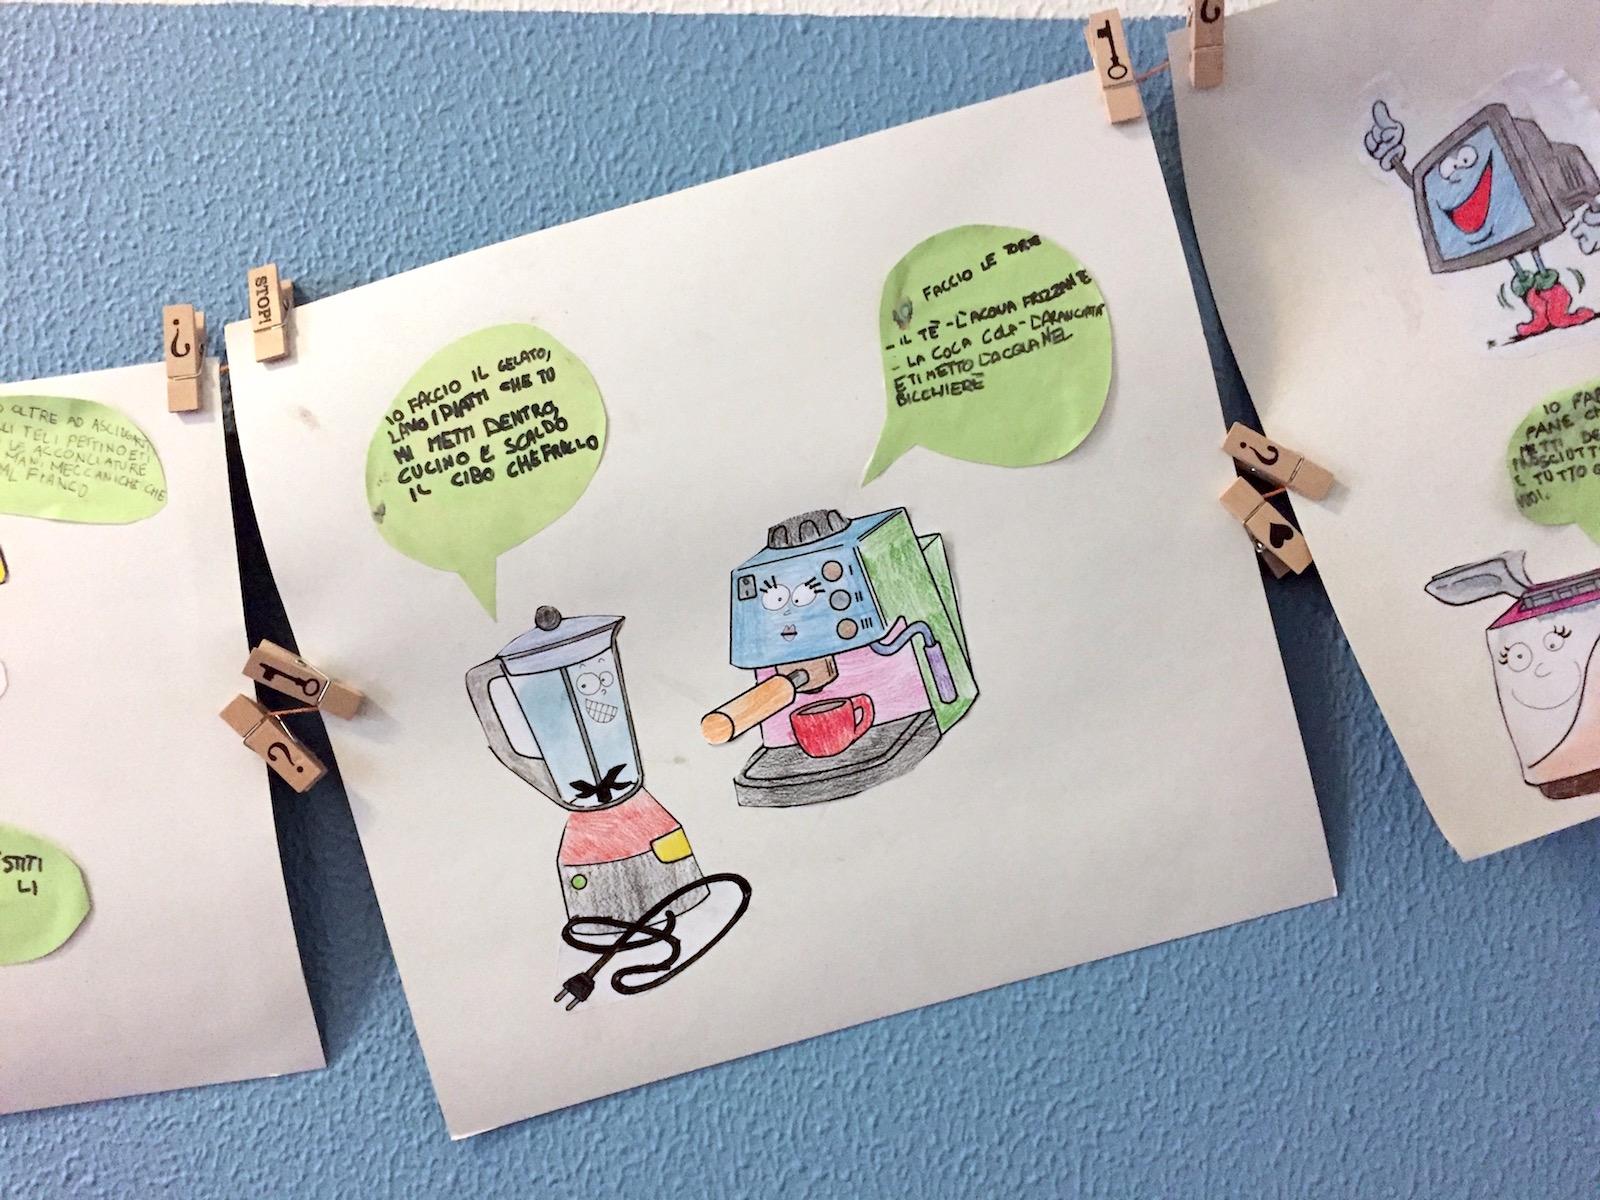 Dire-Mangiare-Progettare-drawings